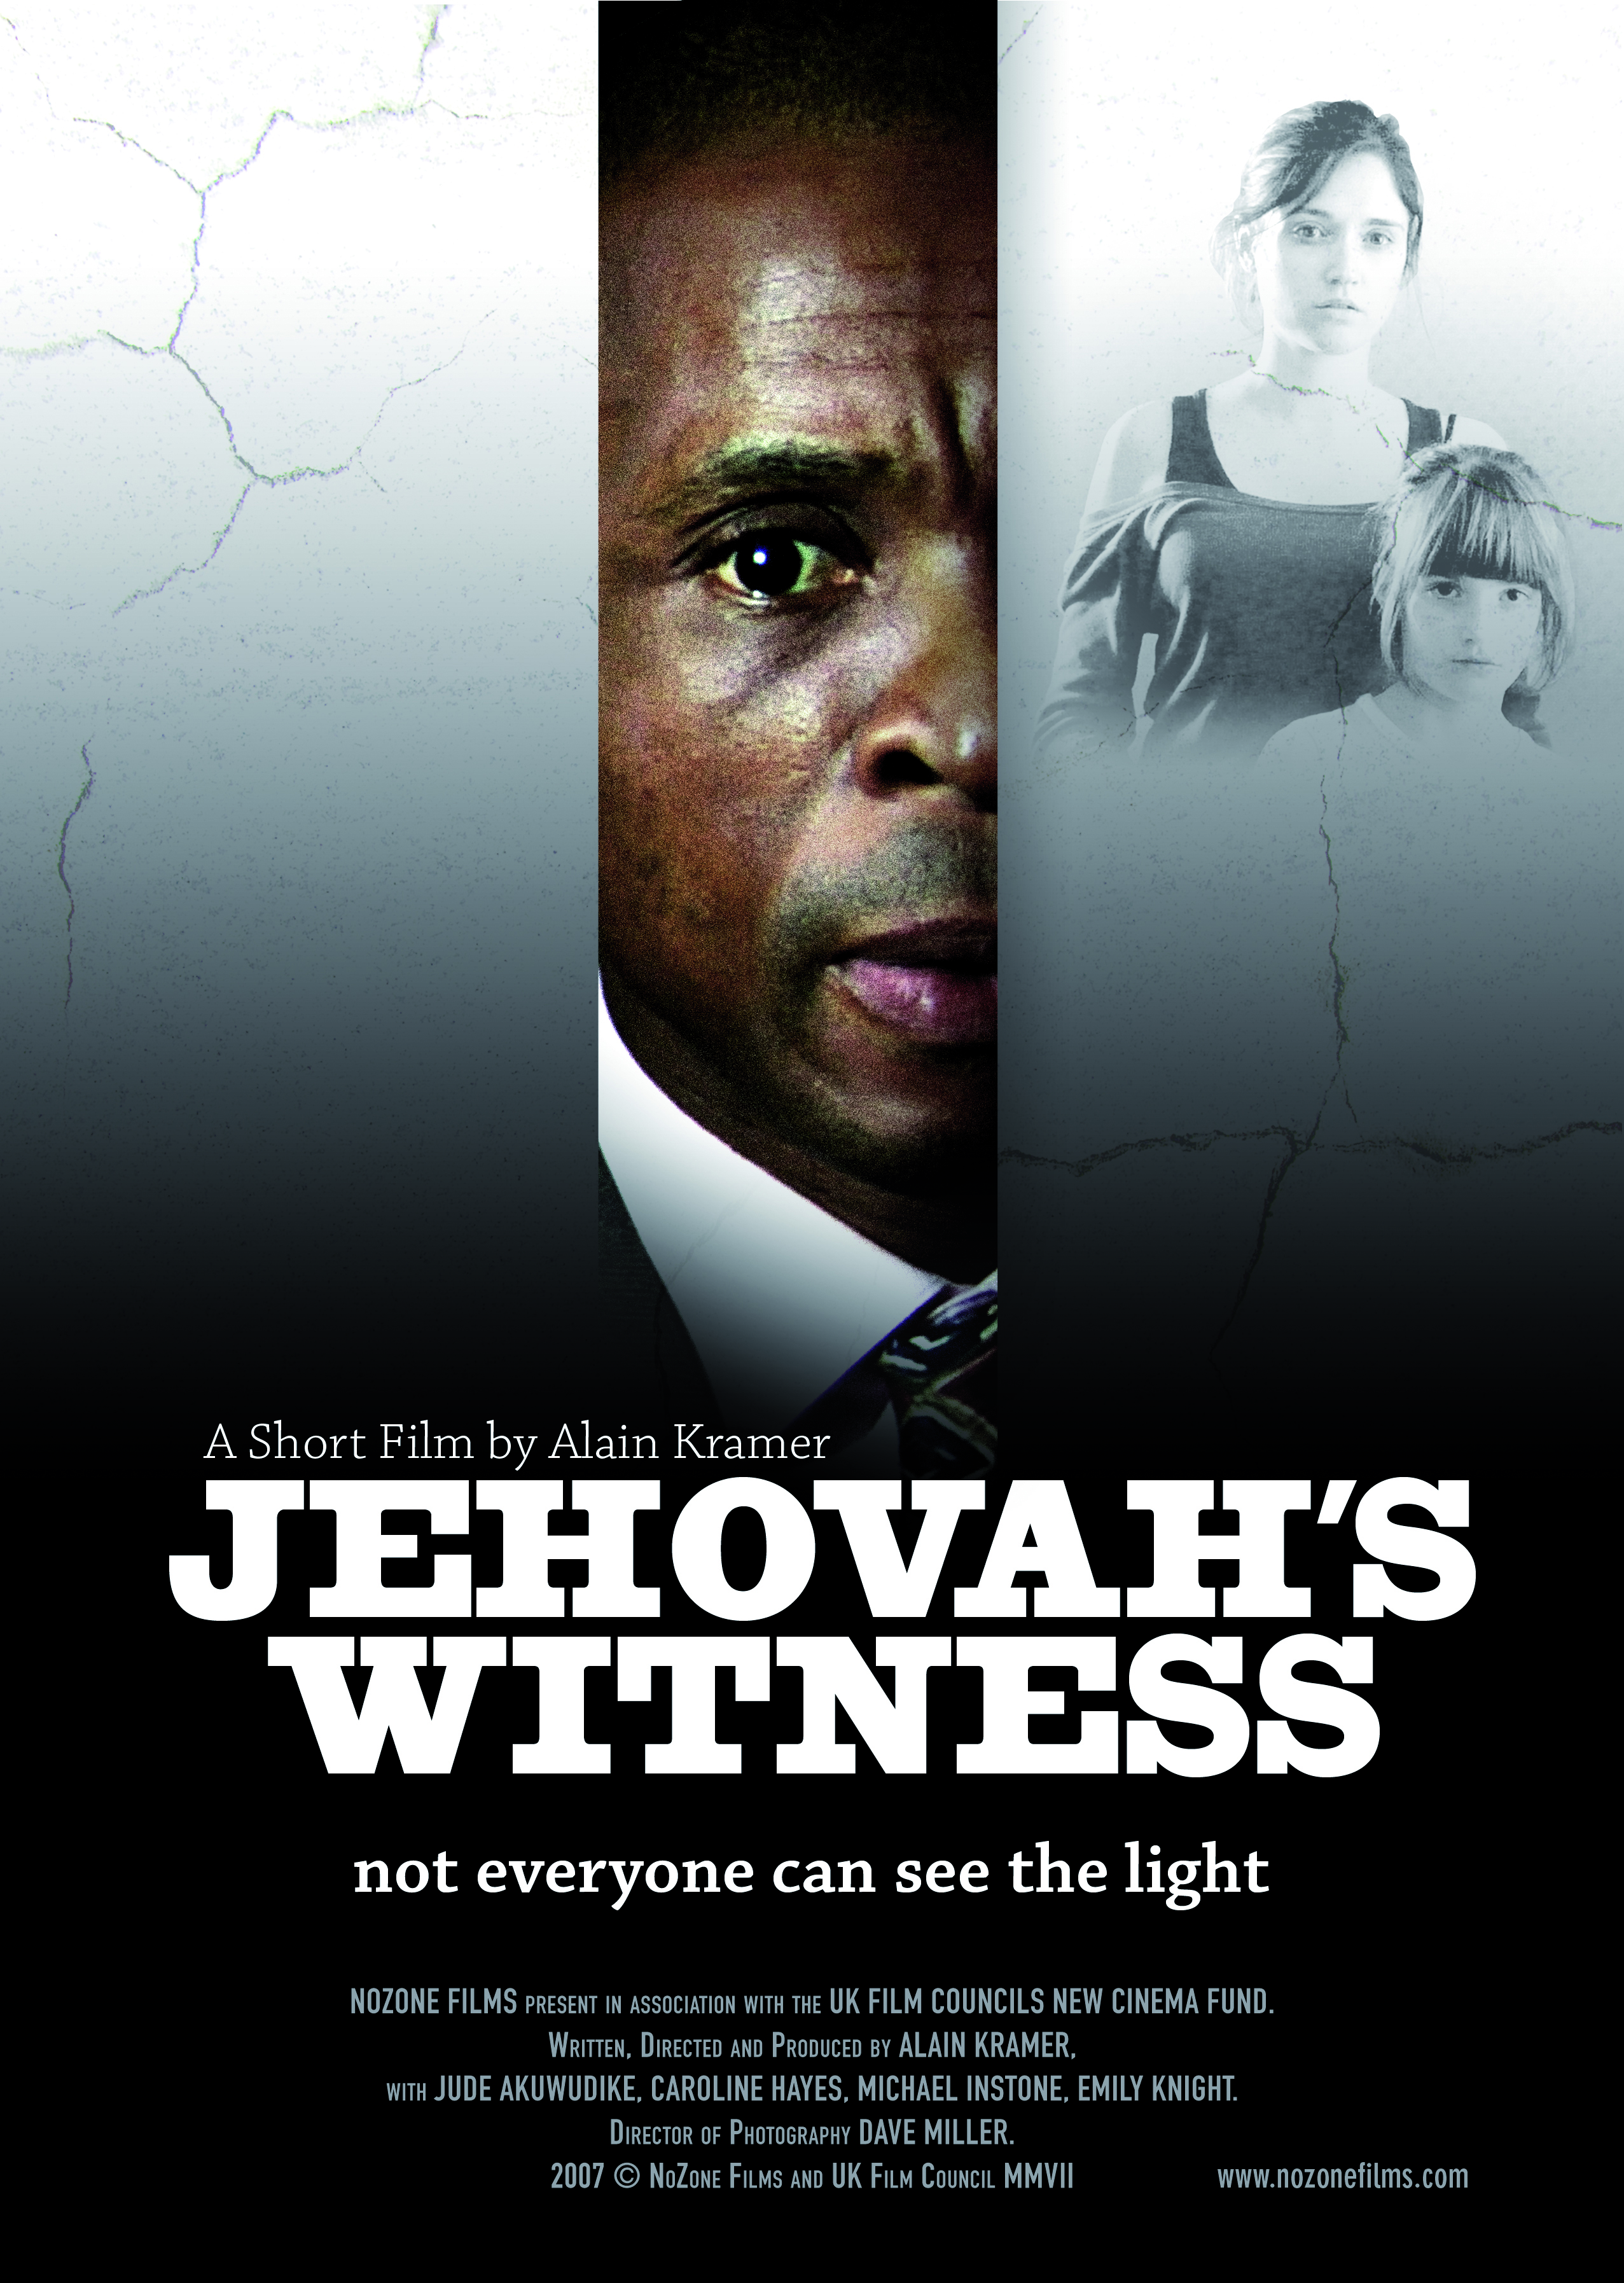 Jehovah vidne dating uk